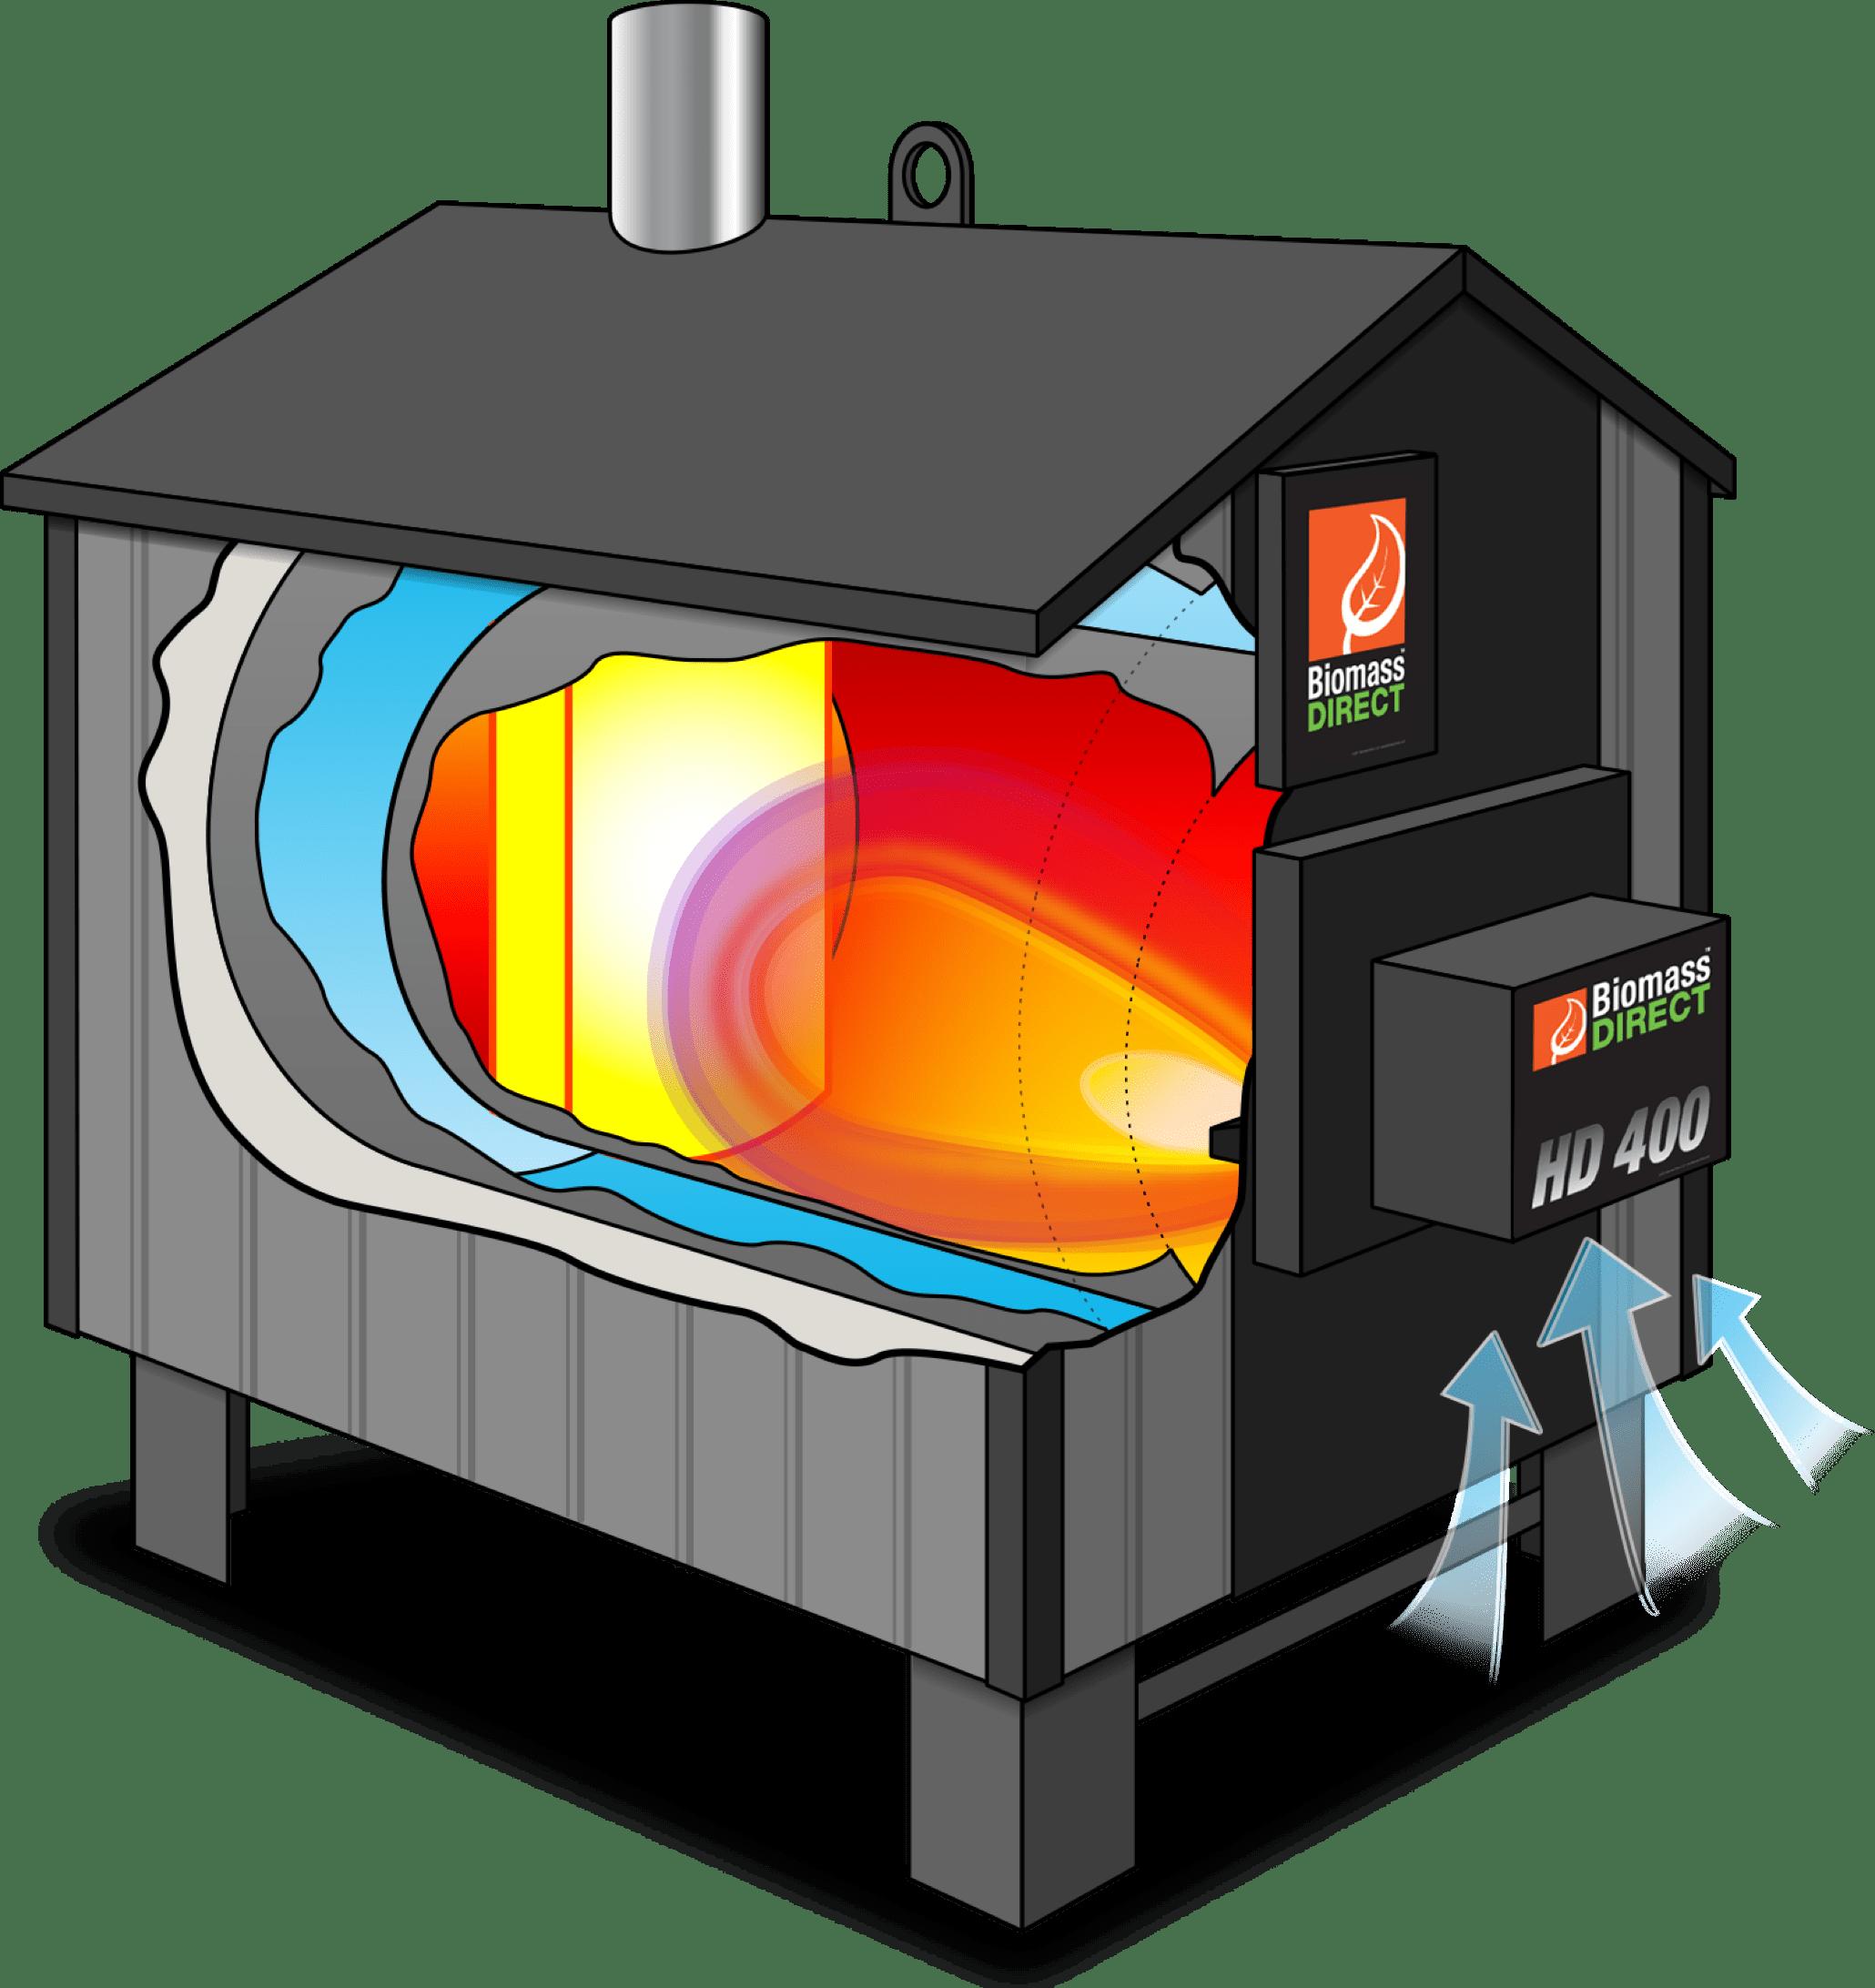 Biomass Direct